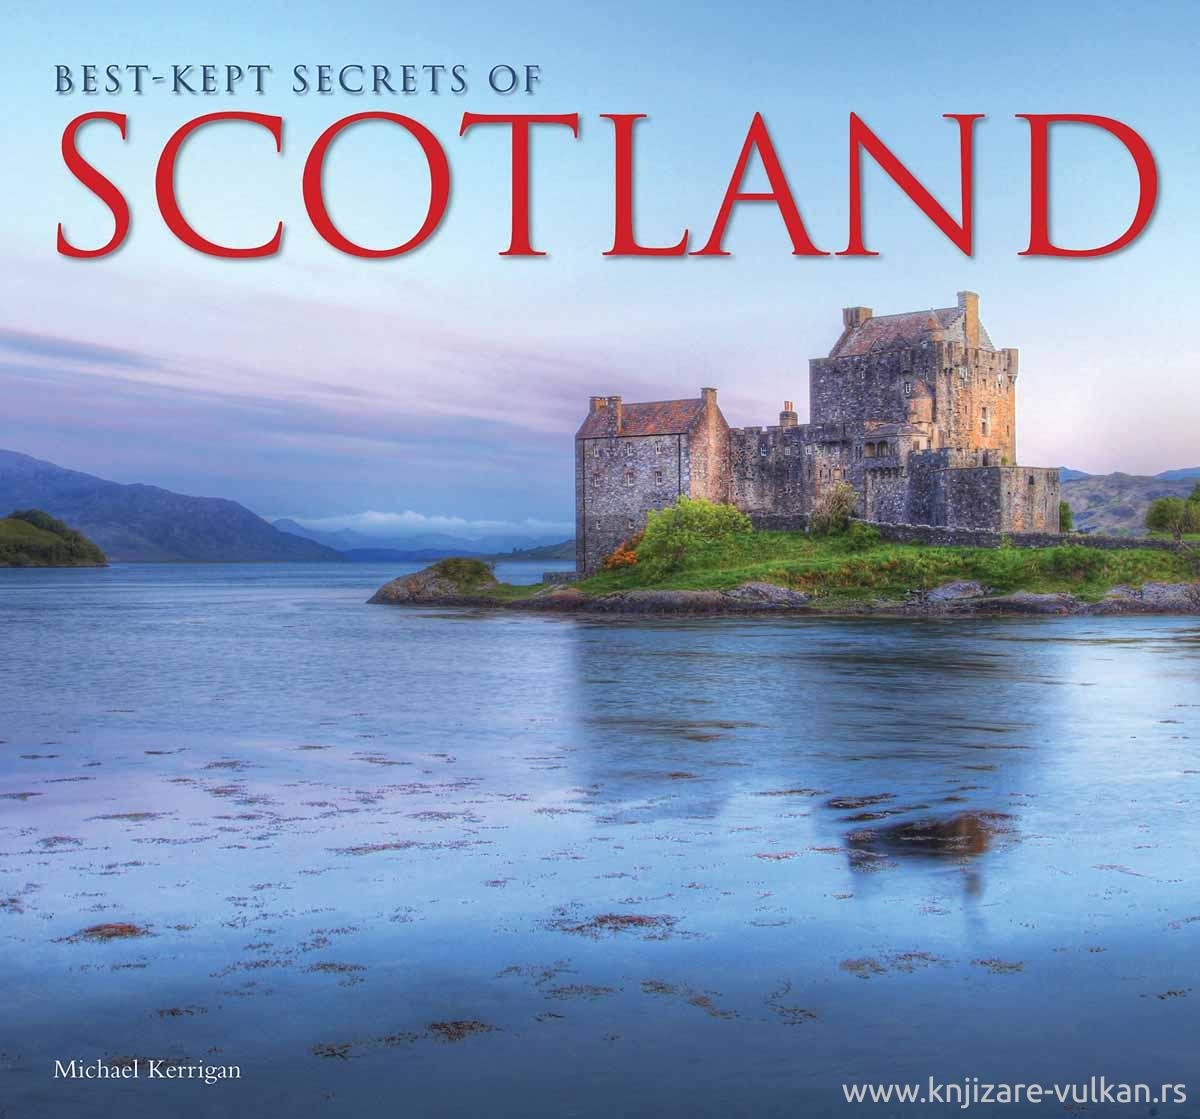 BEST-KEPT SECRETS OF SCOTLAND